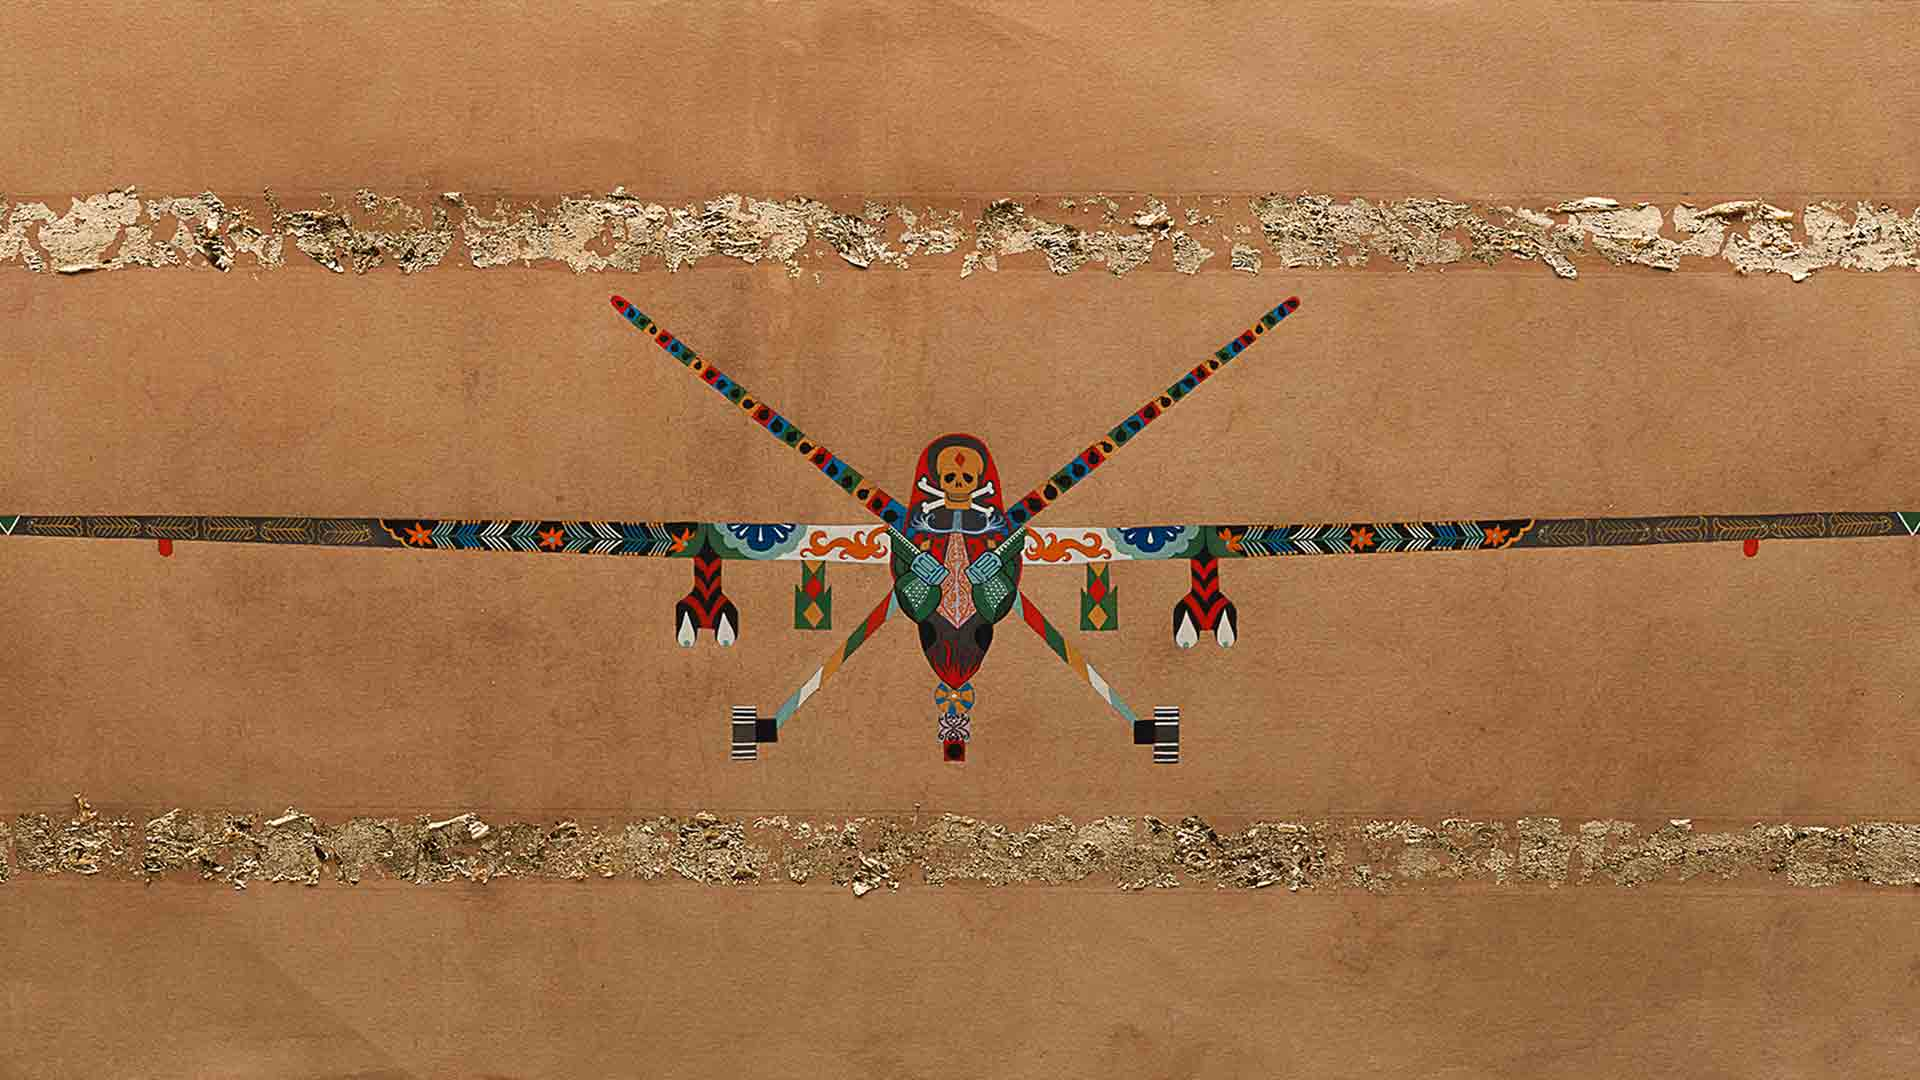 Guggenheim Recipient, UMD Alum Uses Kites to Connect Children Across the Globe